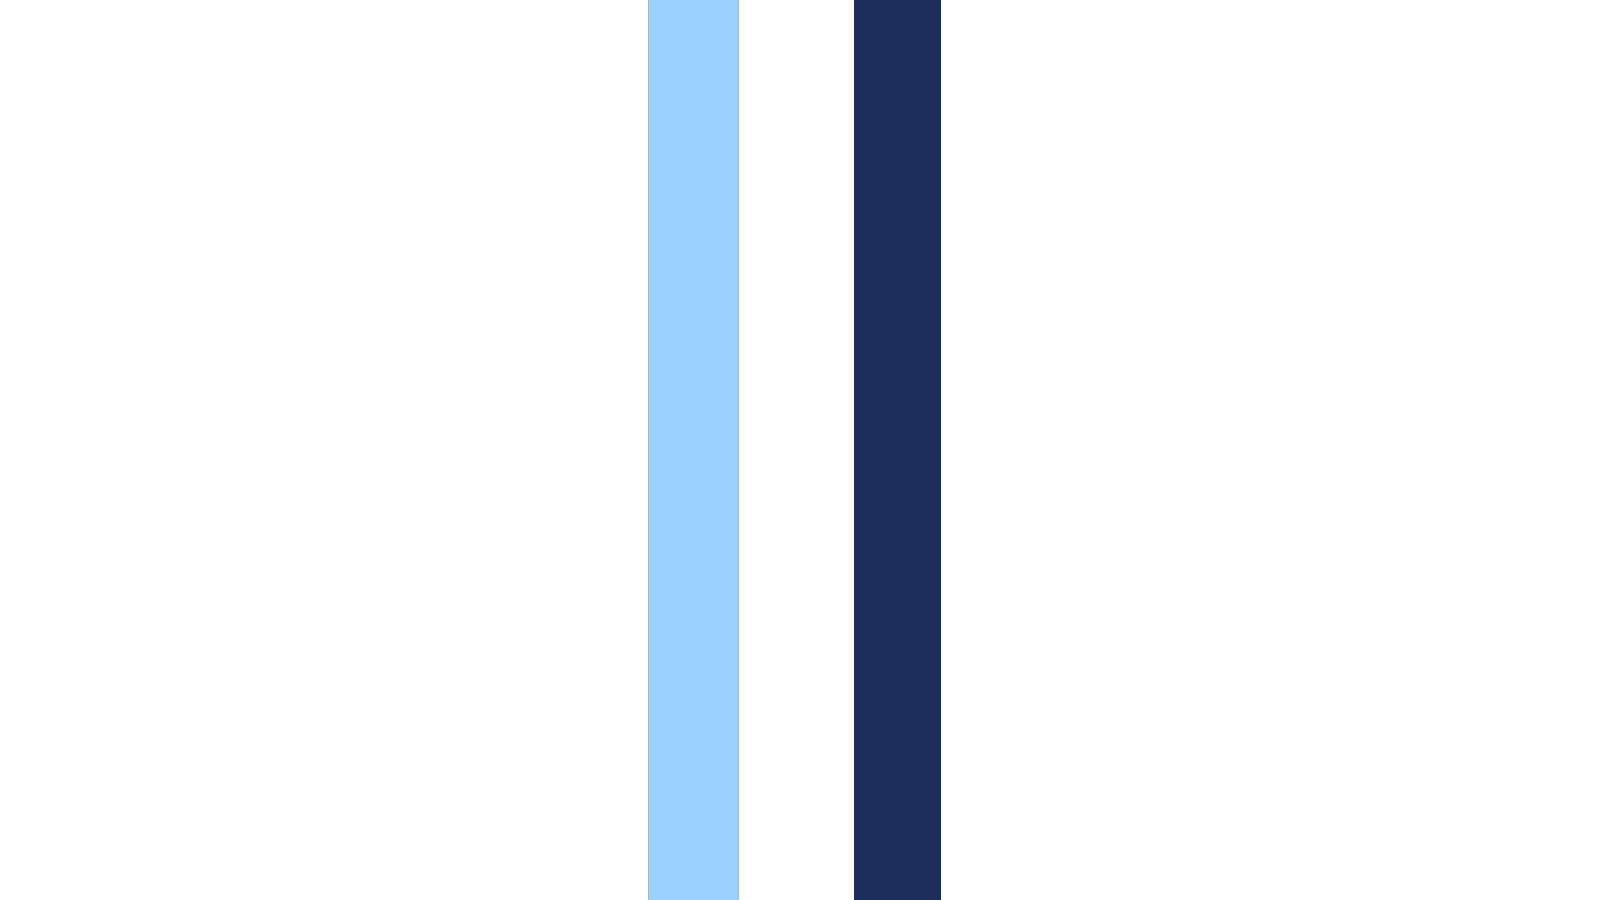 Minnesota Twins at Toronto Blue Jays